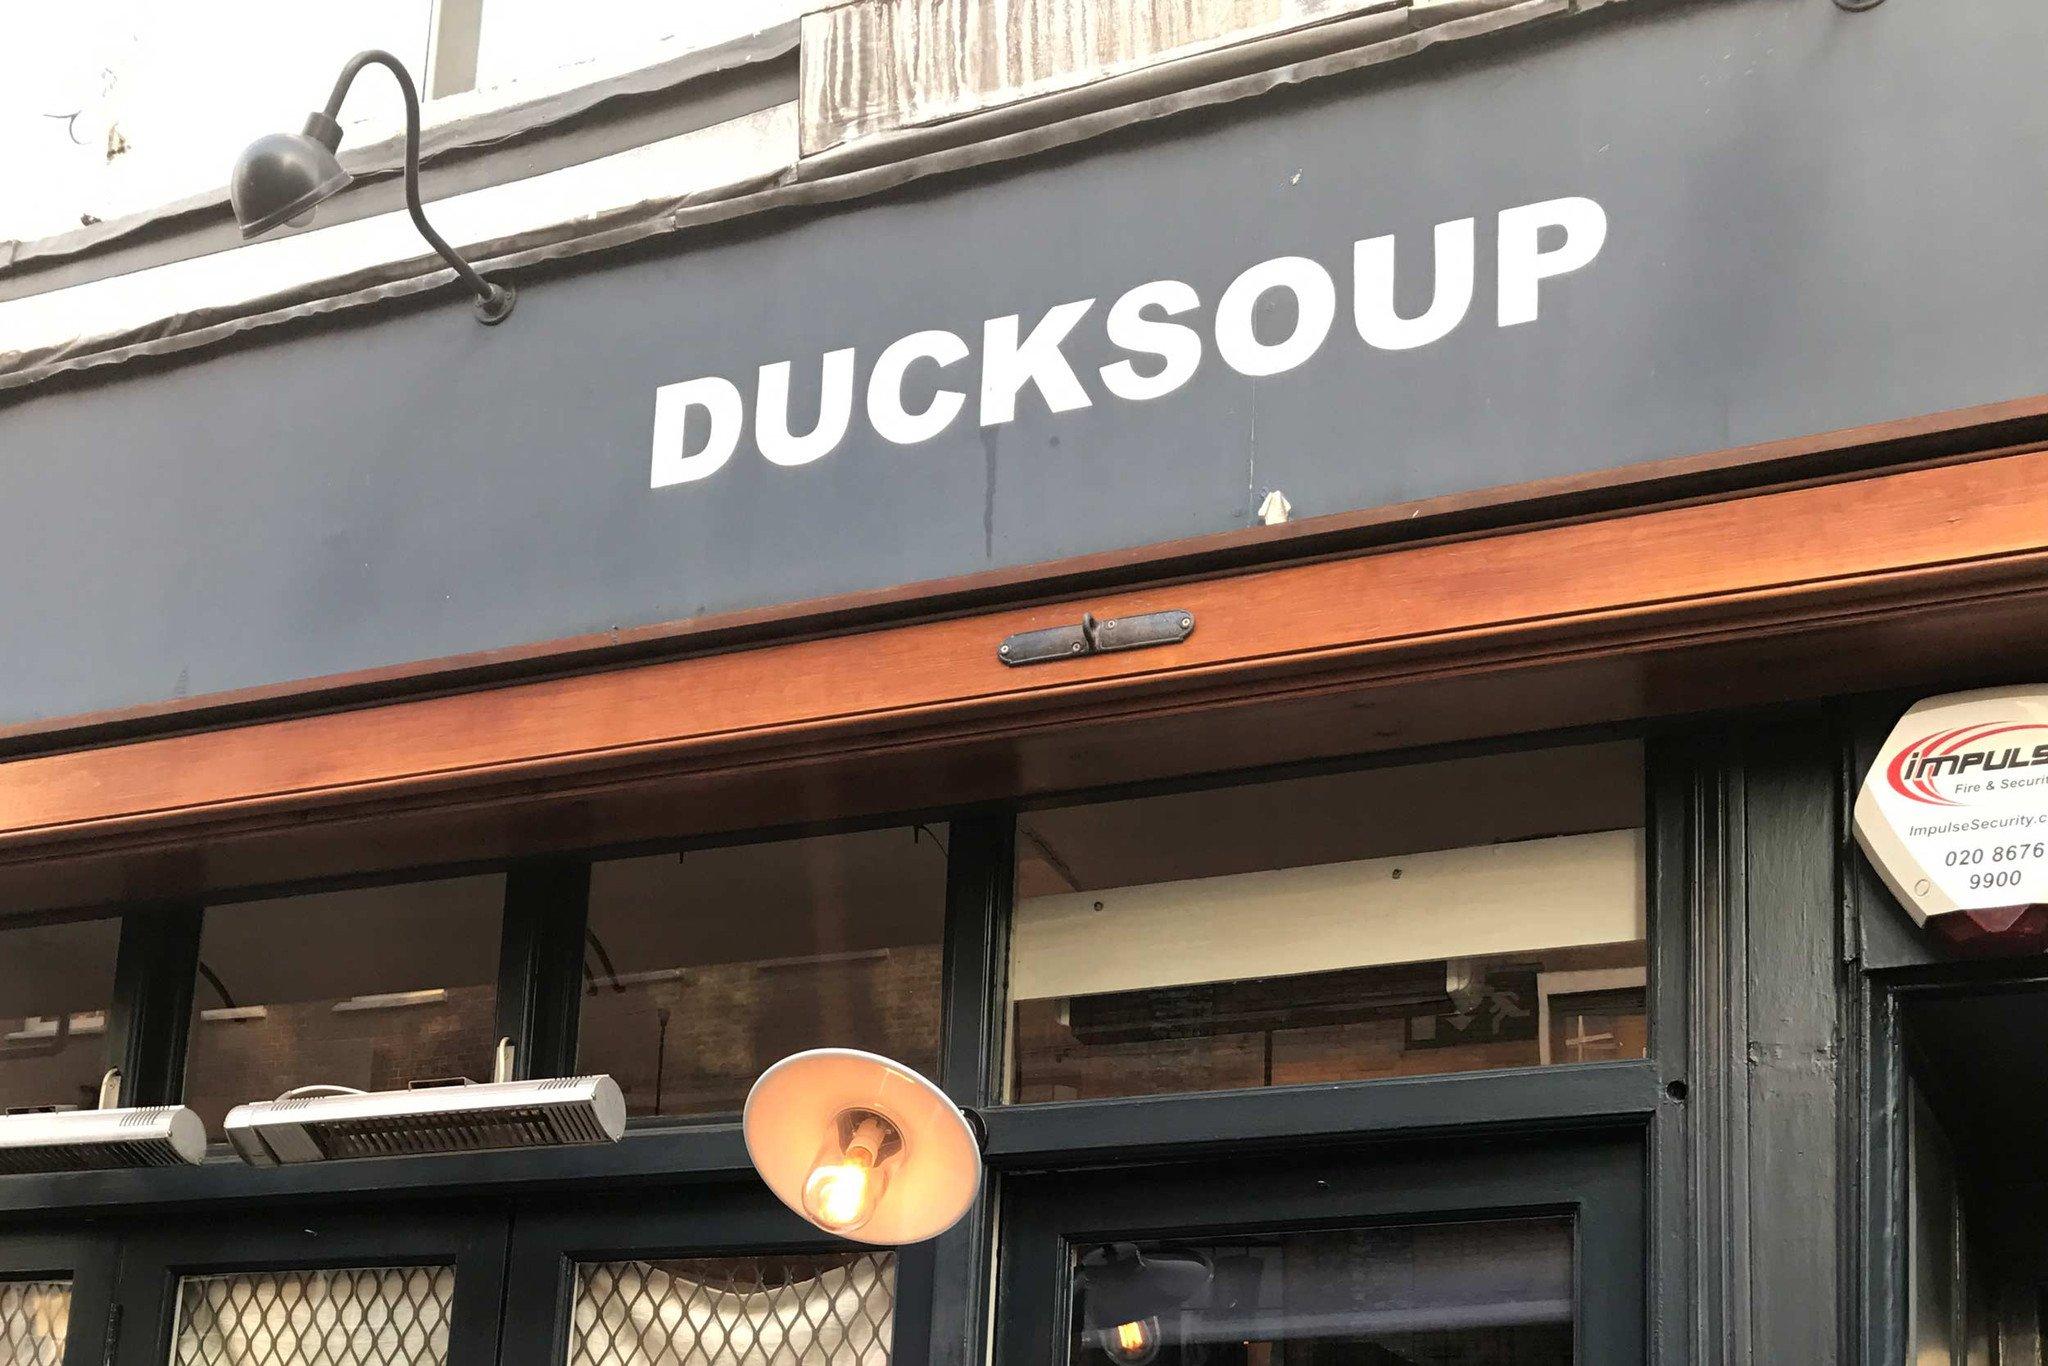 Ducksoup Restaurant in London, England